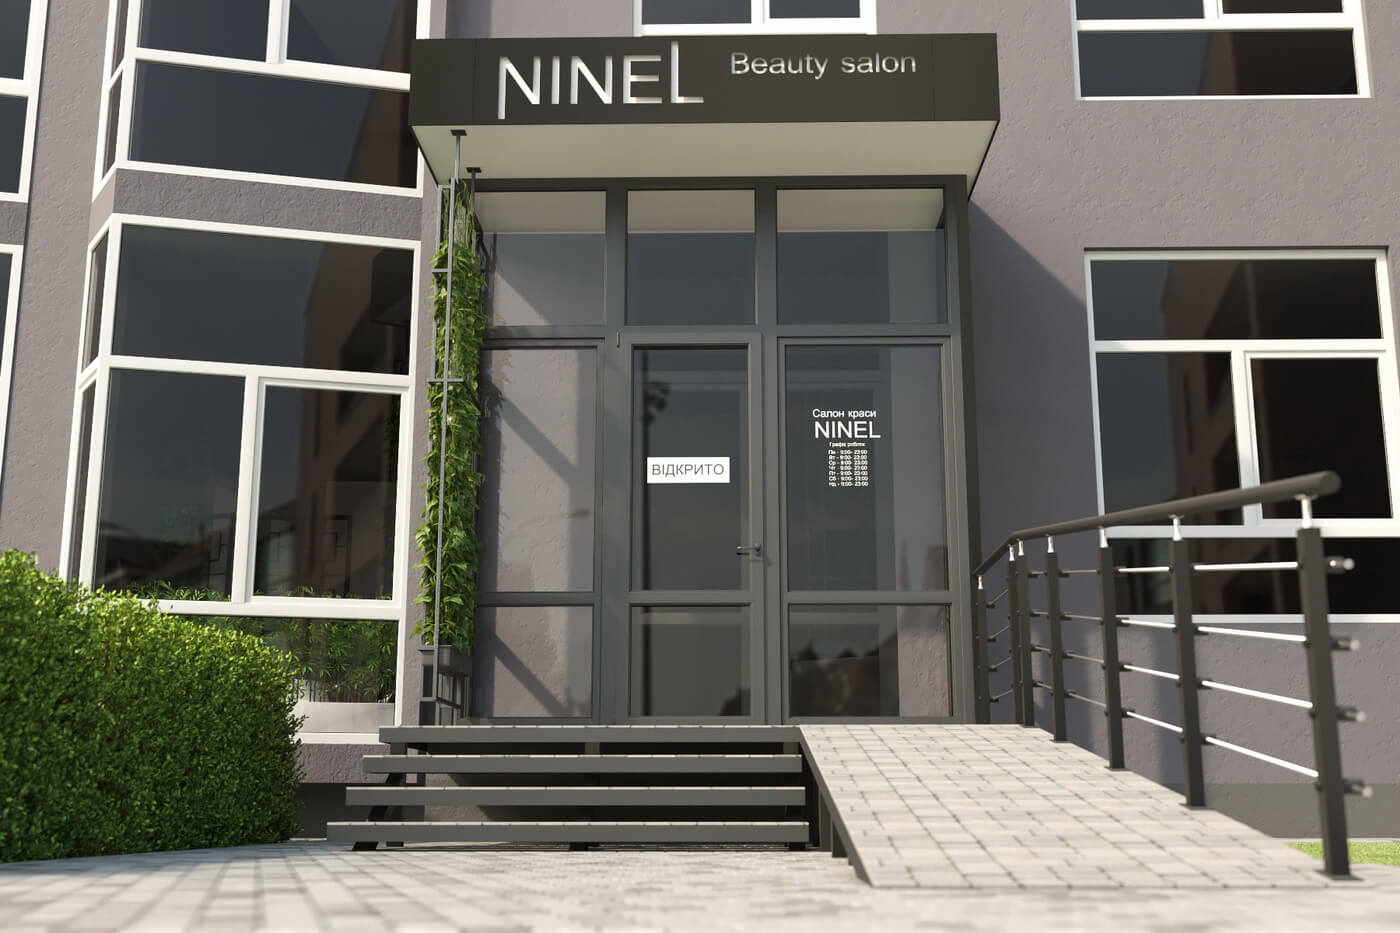 "Экстерьер салона красоты ""Ninel"". Вход в салон красоты."